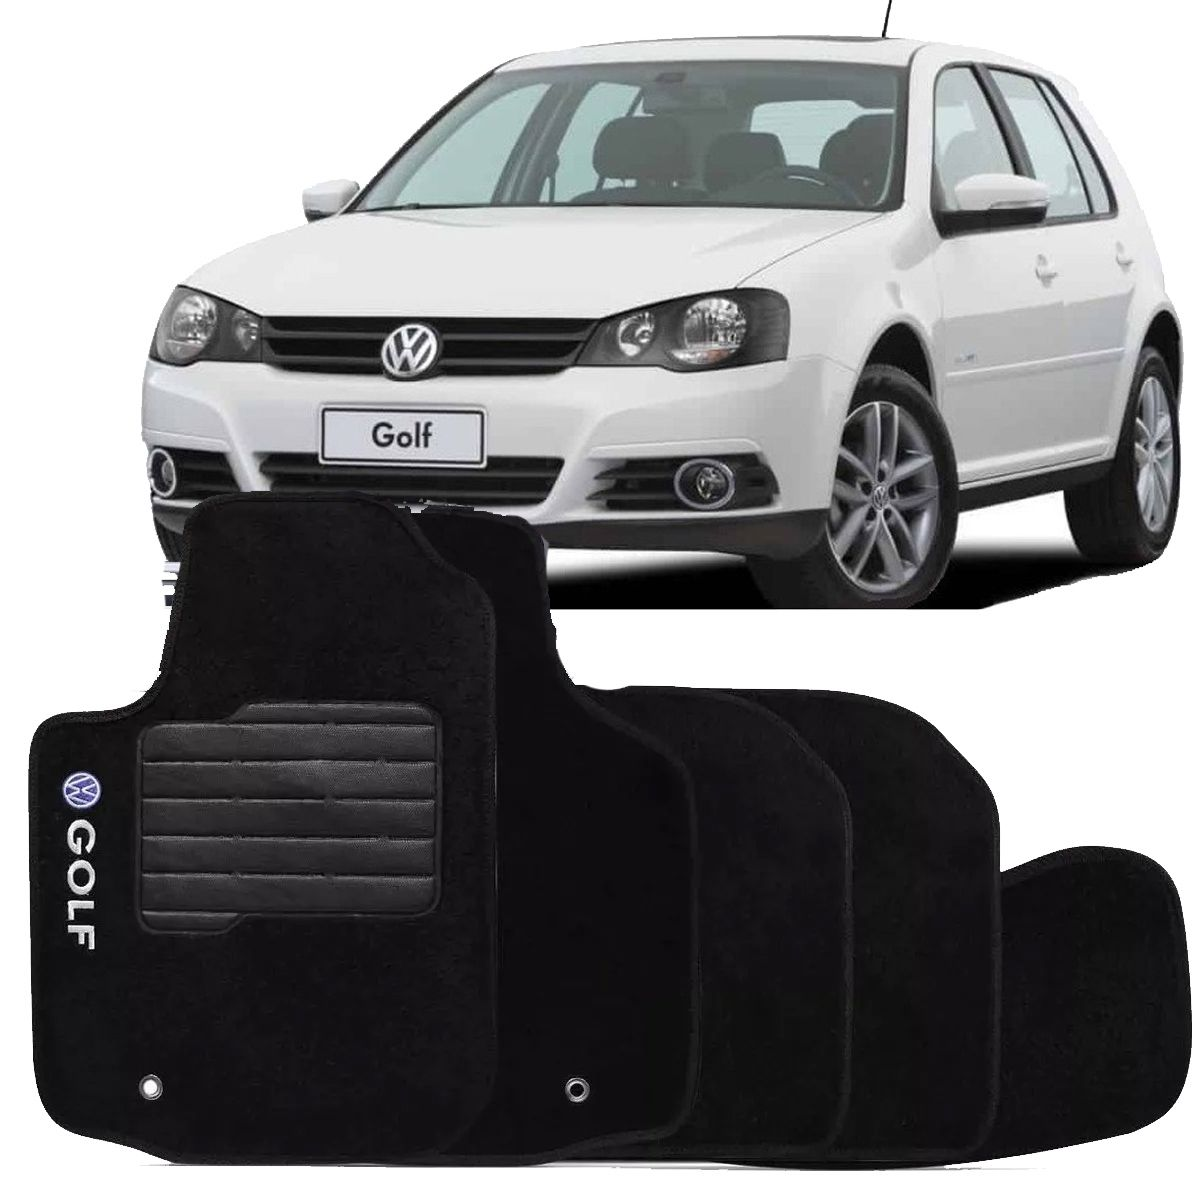 Jogo de Tapete Carpete Golf Bordado Logo Automotivo Preto Personalizado Volkswagen